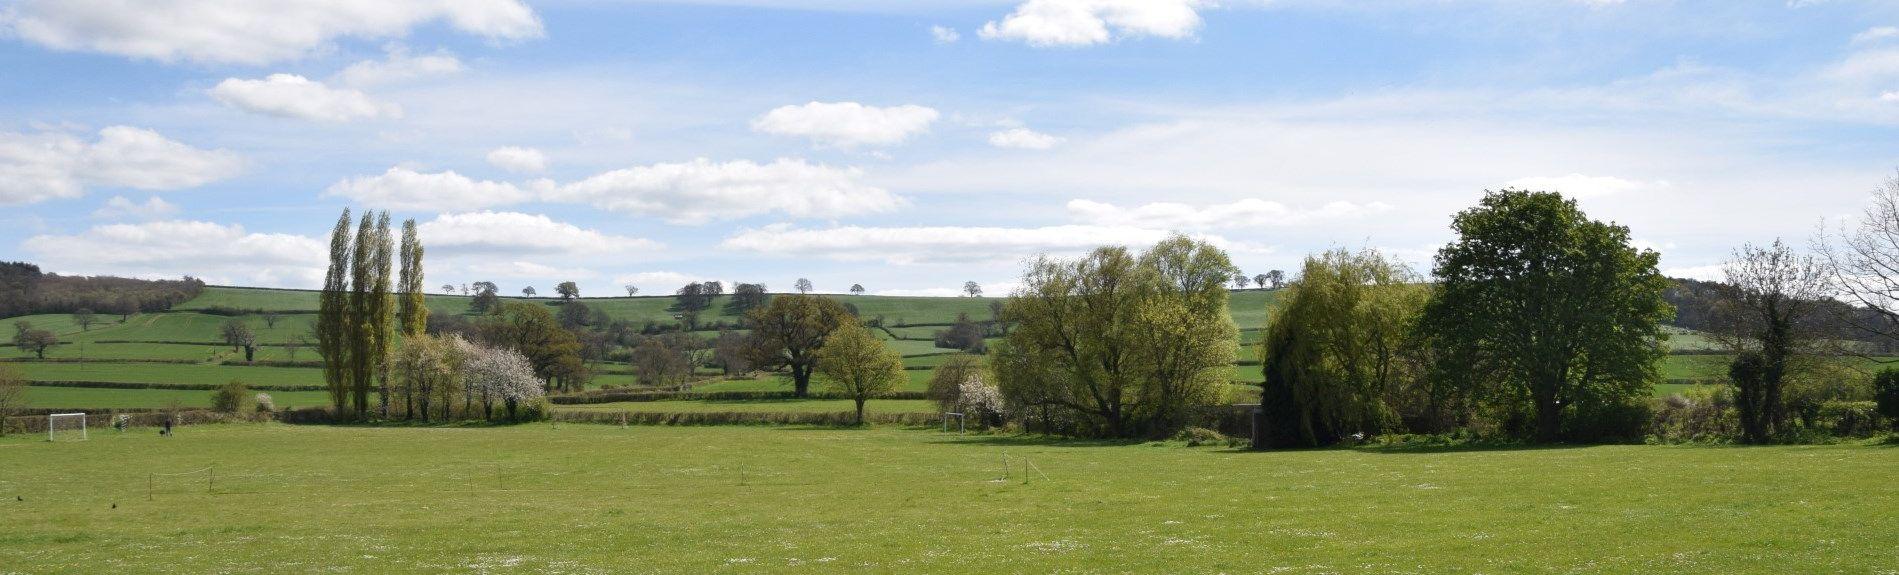 Sturminster Newton, Angleterre, Royaume-Uni